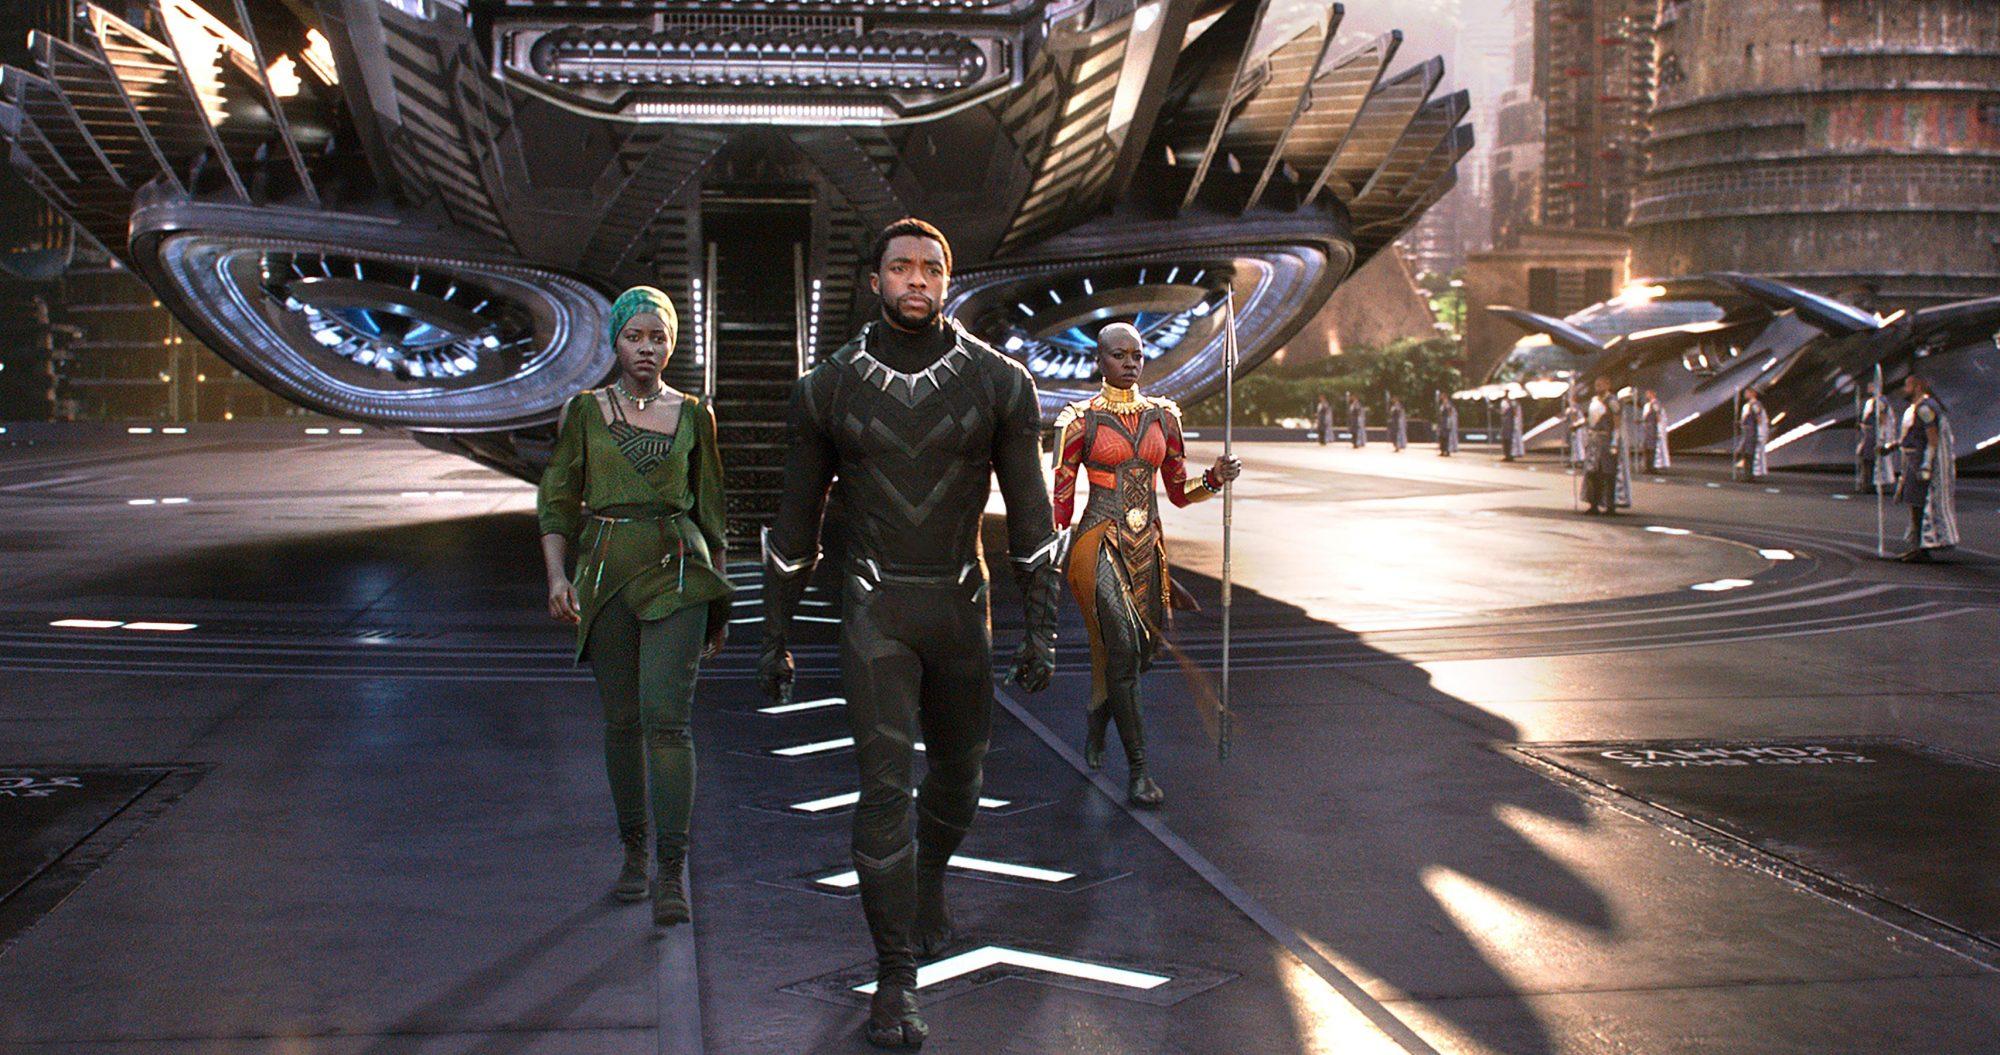 Marvel Studios' BLACK PANTHER..L to R: Nakia (Lupita Nyong'o), T'Challa/Black Panther (Chadwick Boseman) and Okoye (Danai Gurira)..Ph: Film Frame..u00A9Marvel Studios 2018